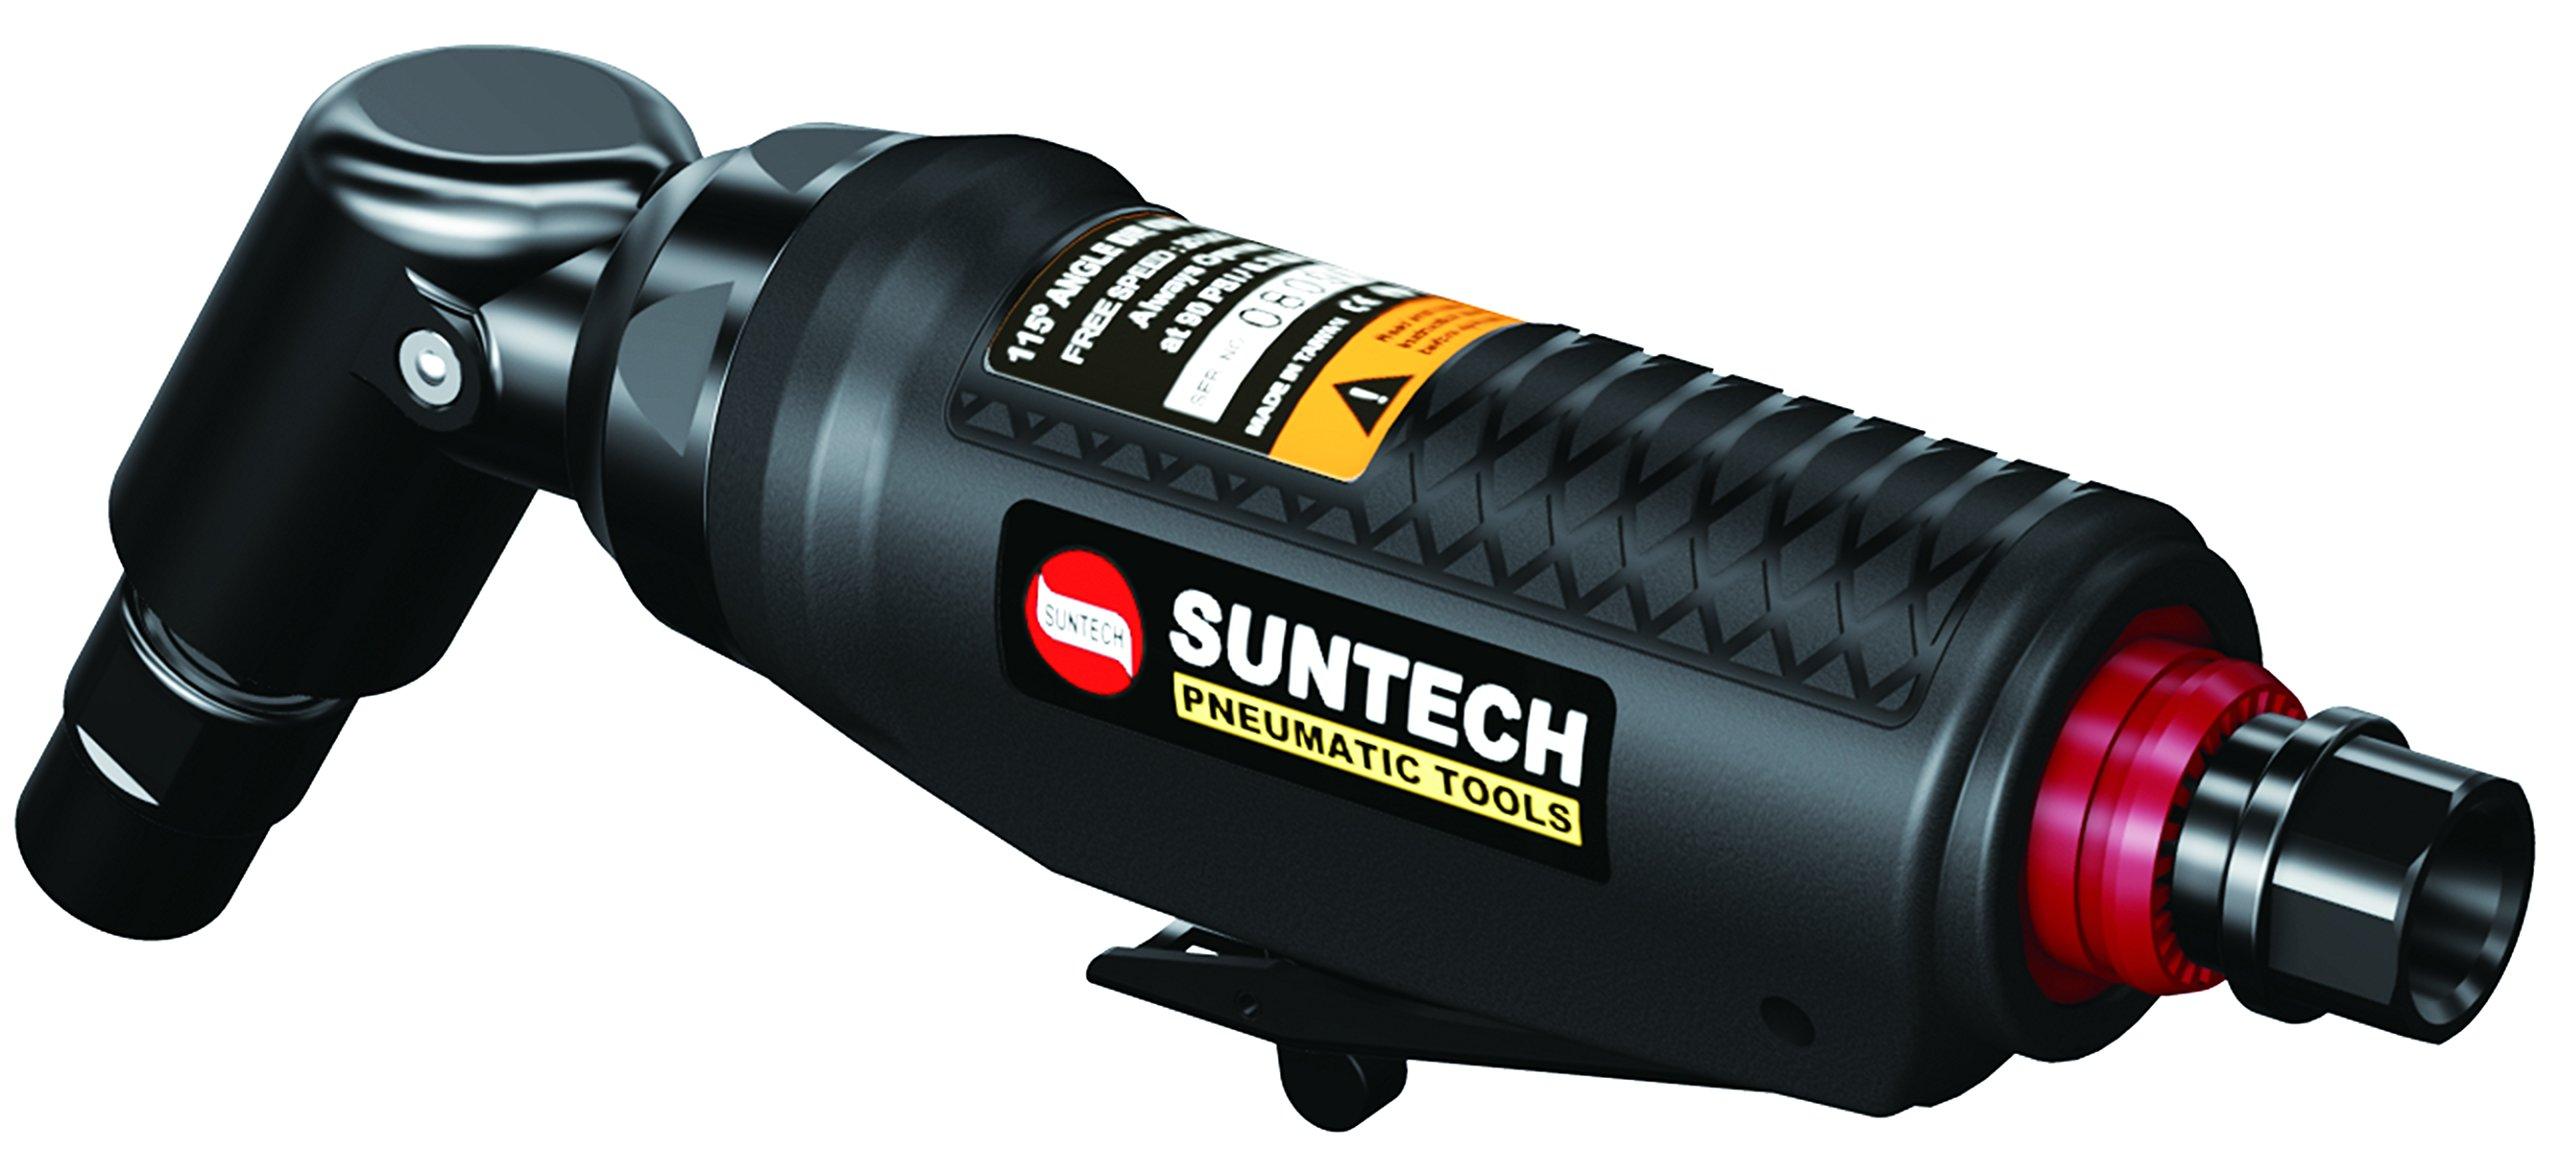 SUNTECH SM-55-5300 Sun match 1/4'' 115 degree Angle Die Grinder, Black